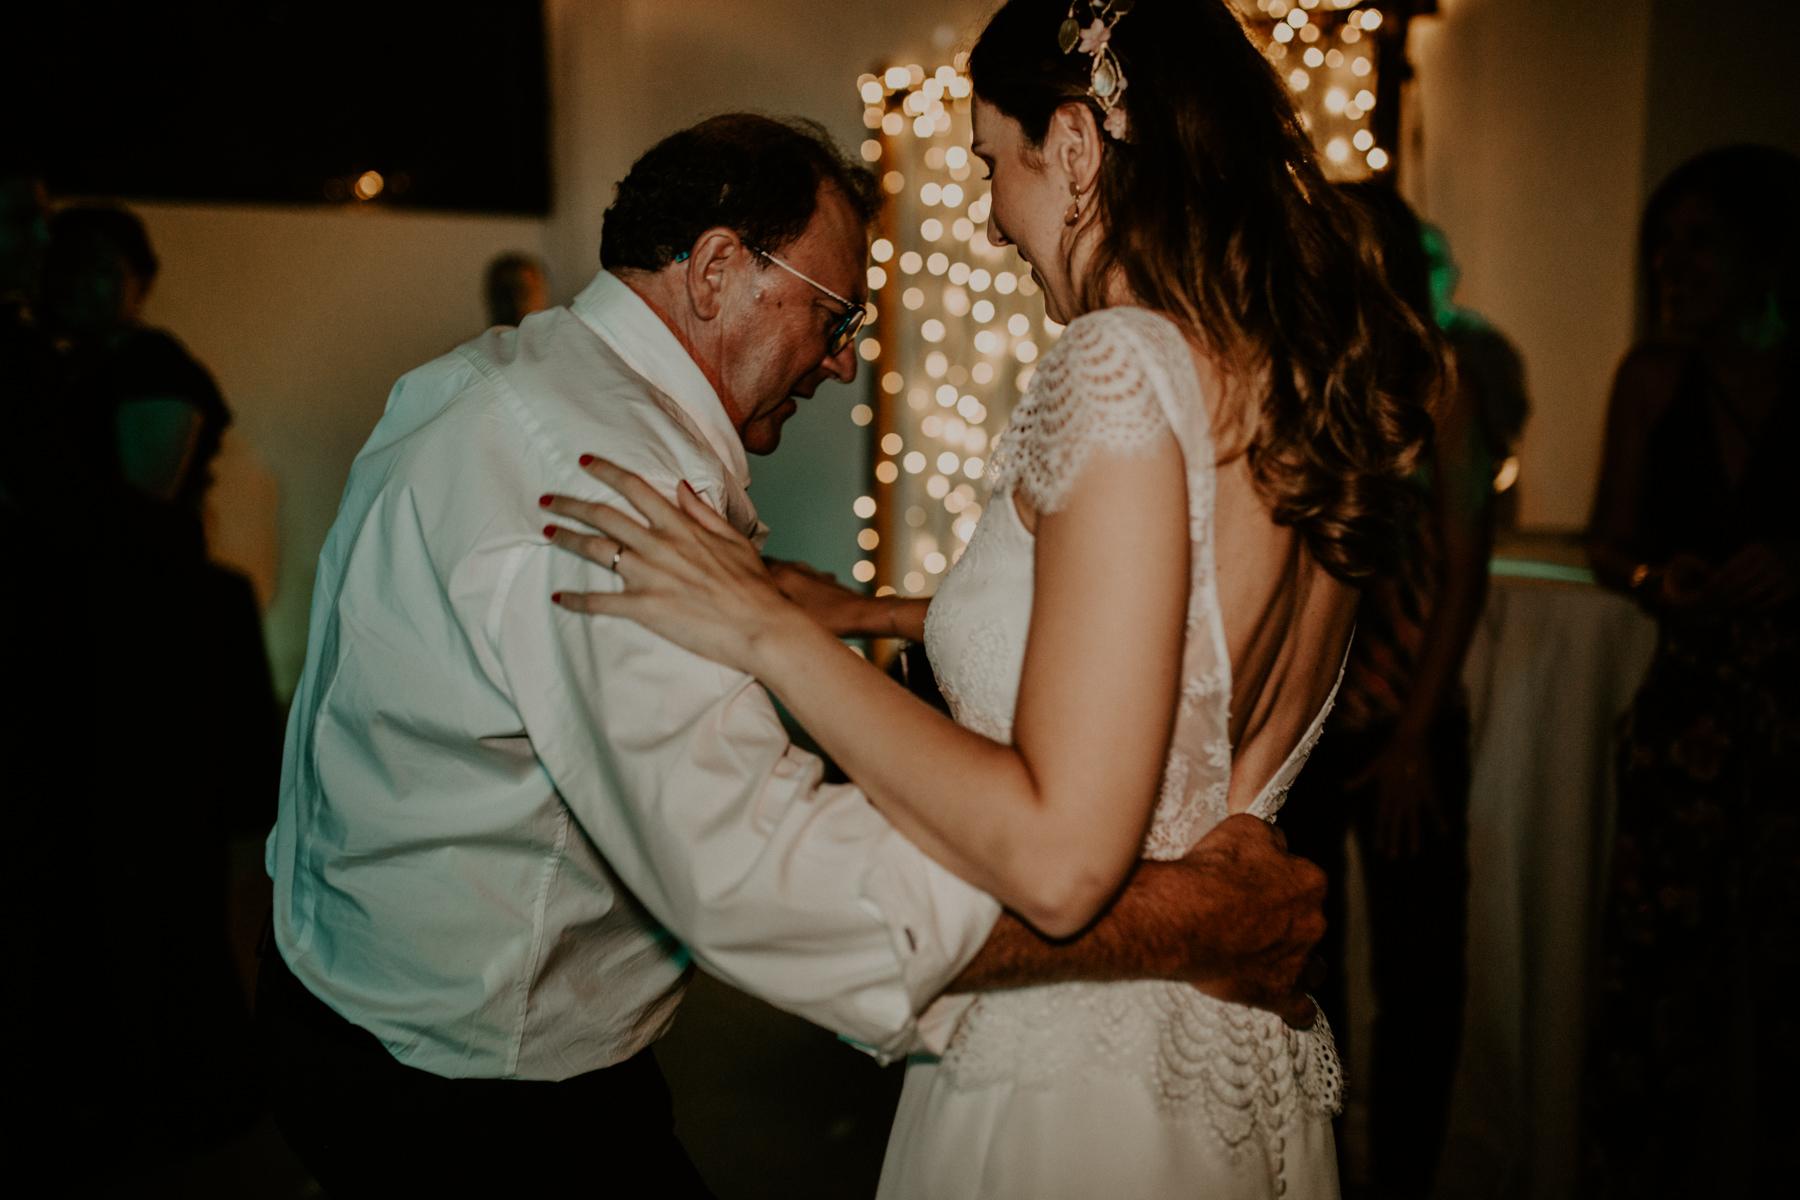 alt_thenortherngirlphotography_couples_weddingphotographer_photographer_wedding_boda_fotografodebodas_fotografobodasbarcelona_bodaindie_bodasconestilo_bodaensantperedeclara_jennifermiguel-984.jpg